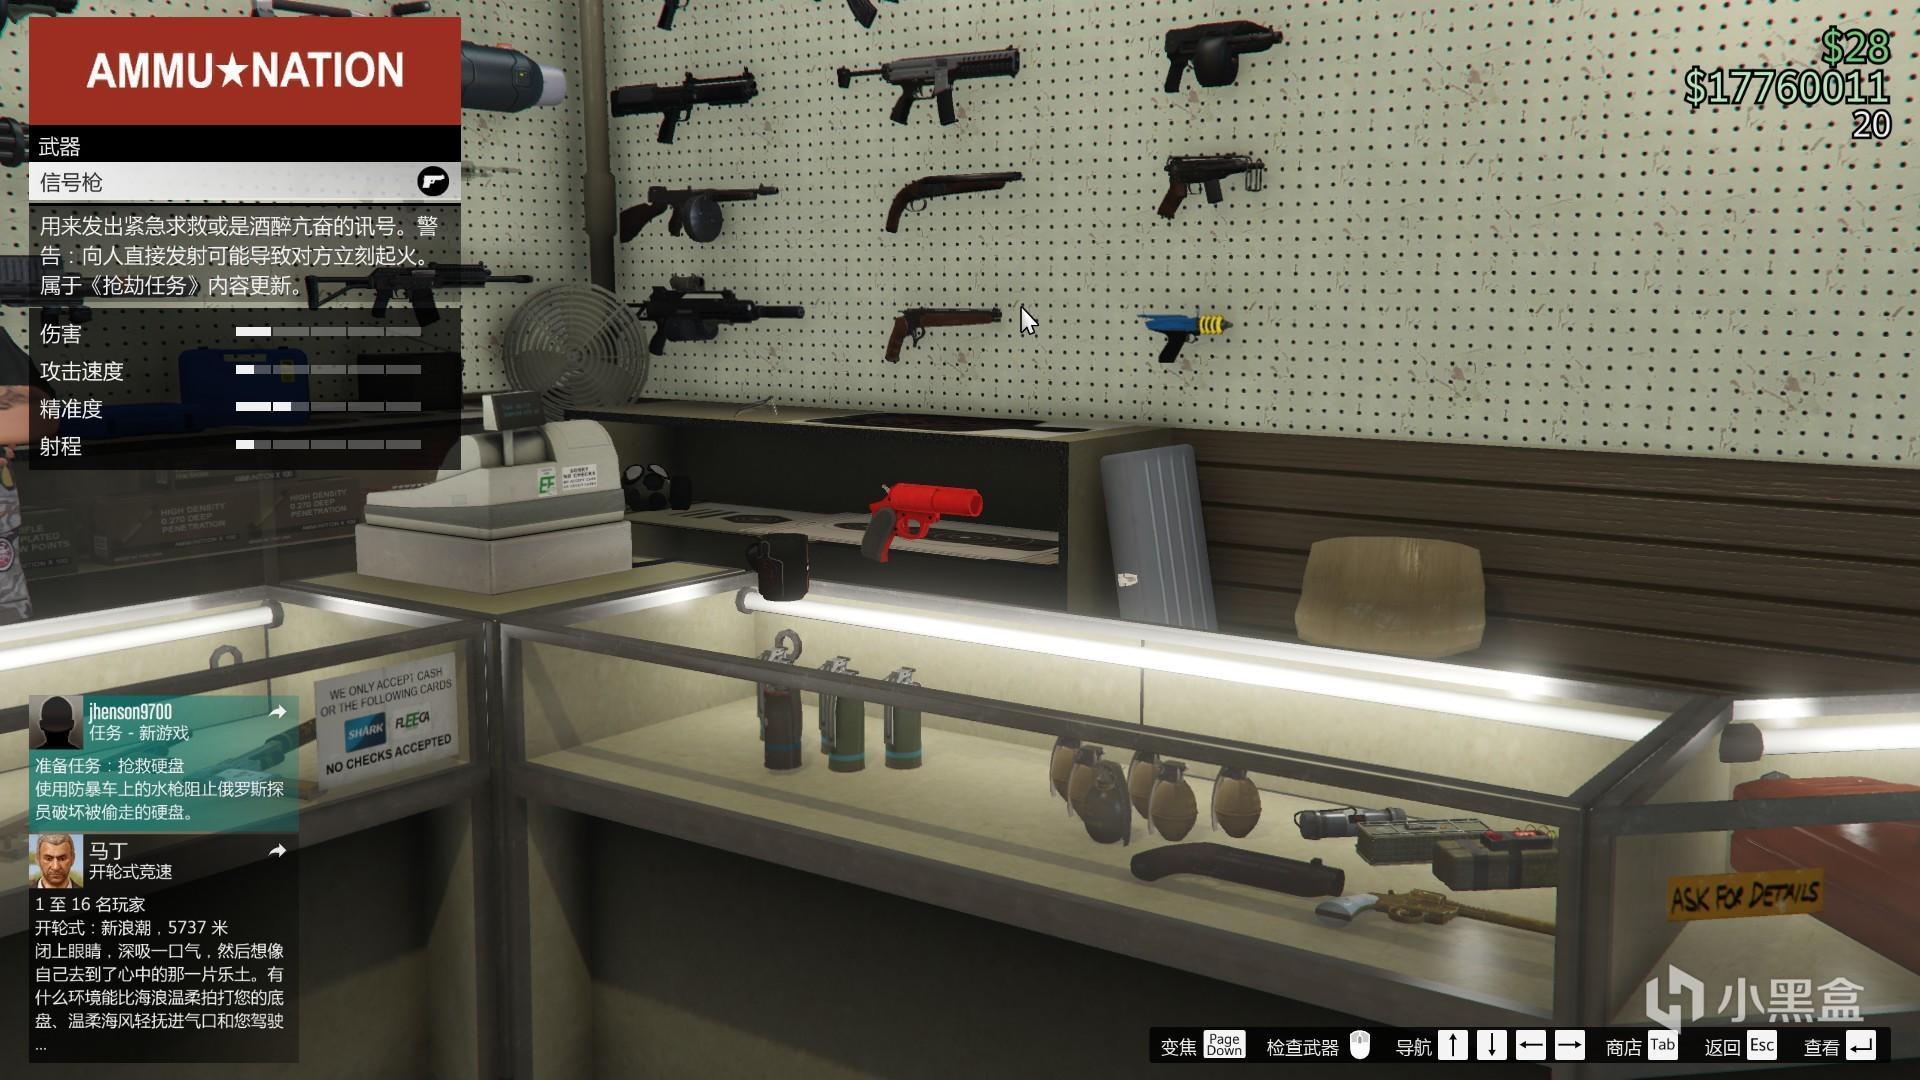 GTA5 线上模式各阶段武器推荐(中期)插图11